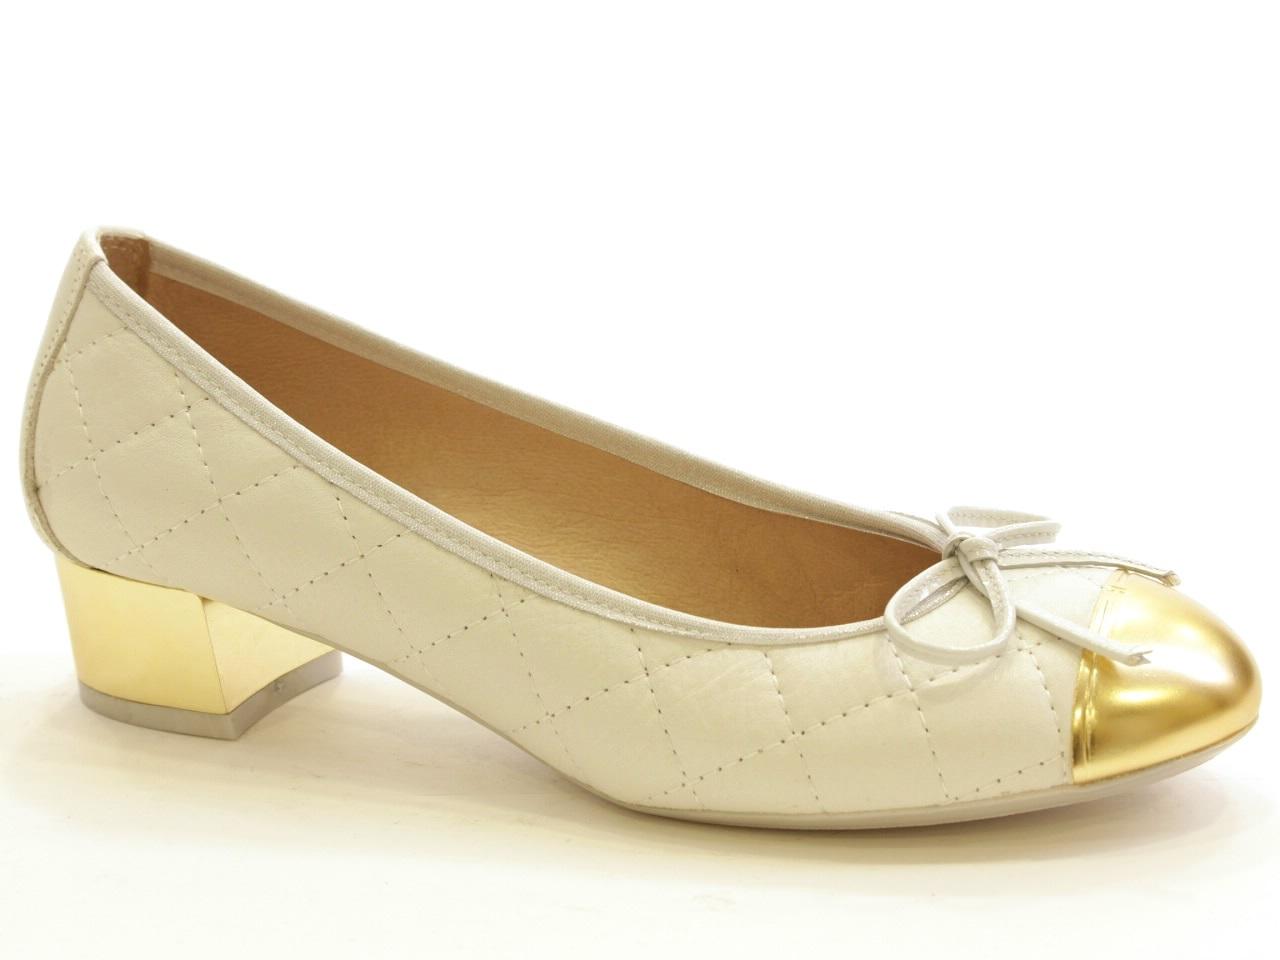 Chaussures Plates, Ballerine, Mocassins Hispanitas - 165 HV49100